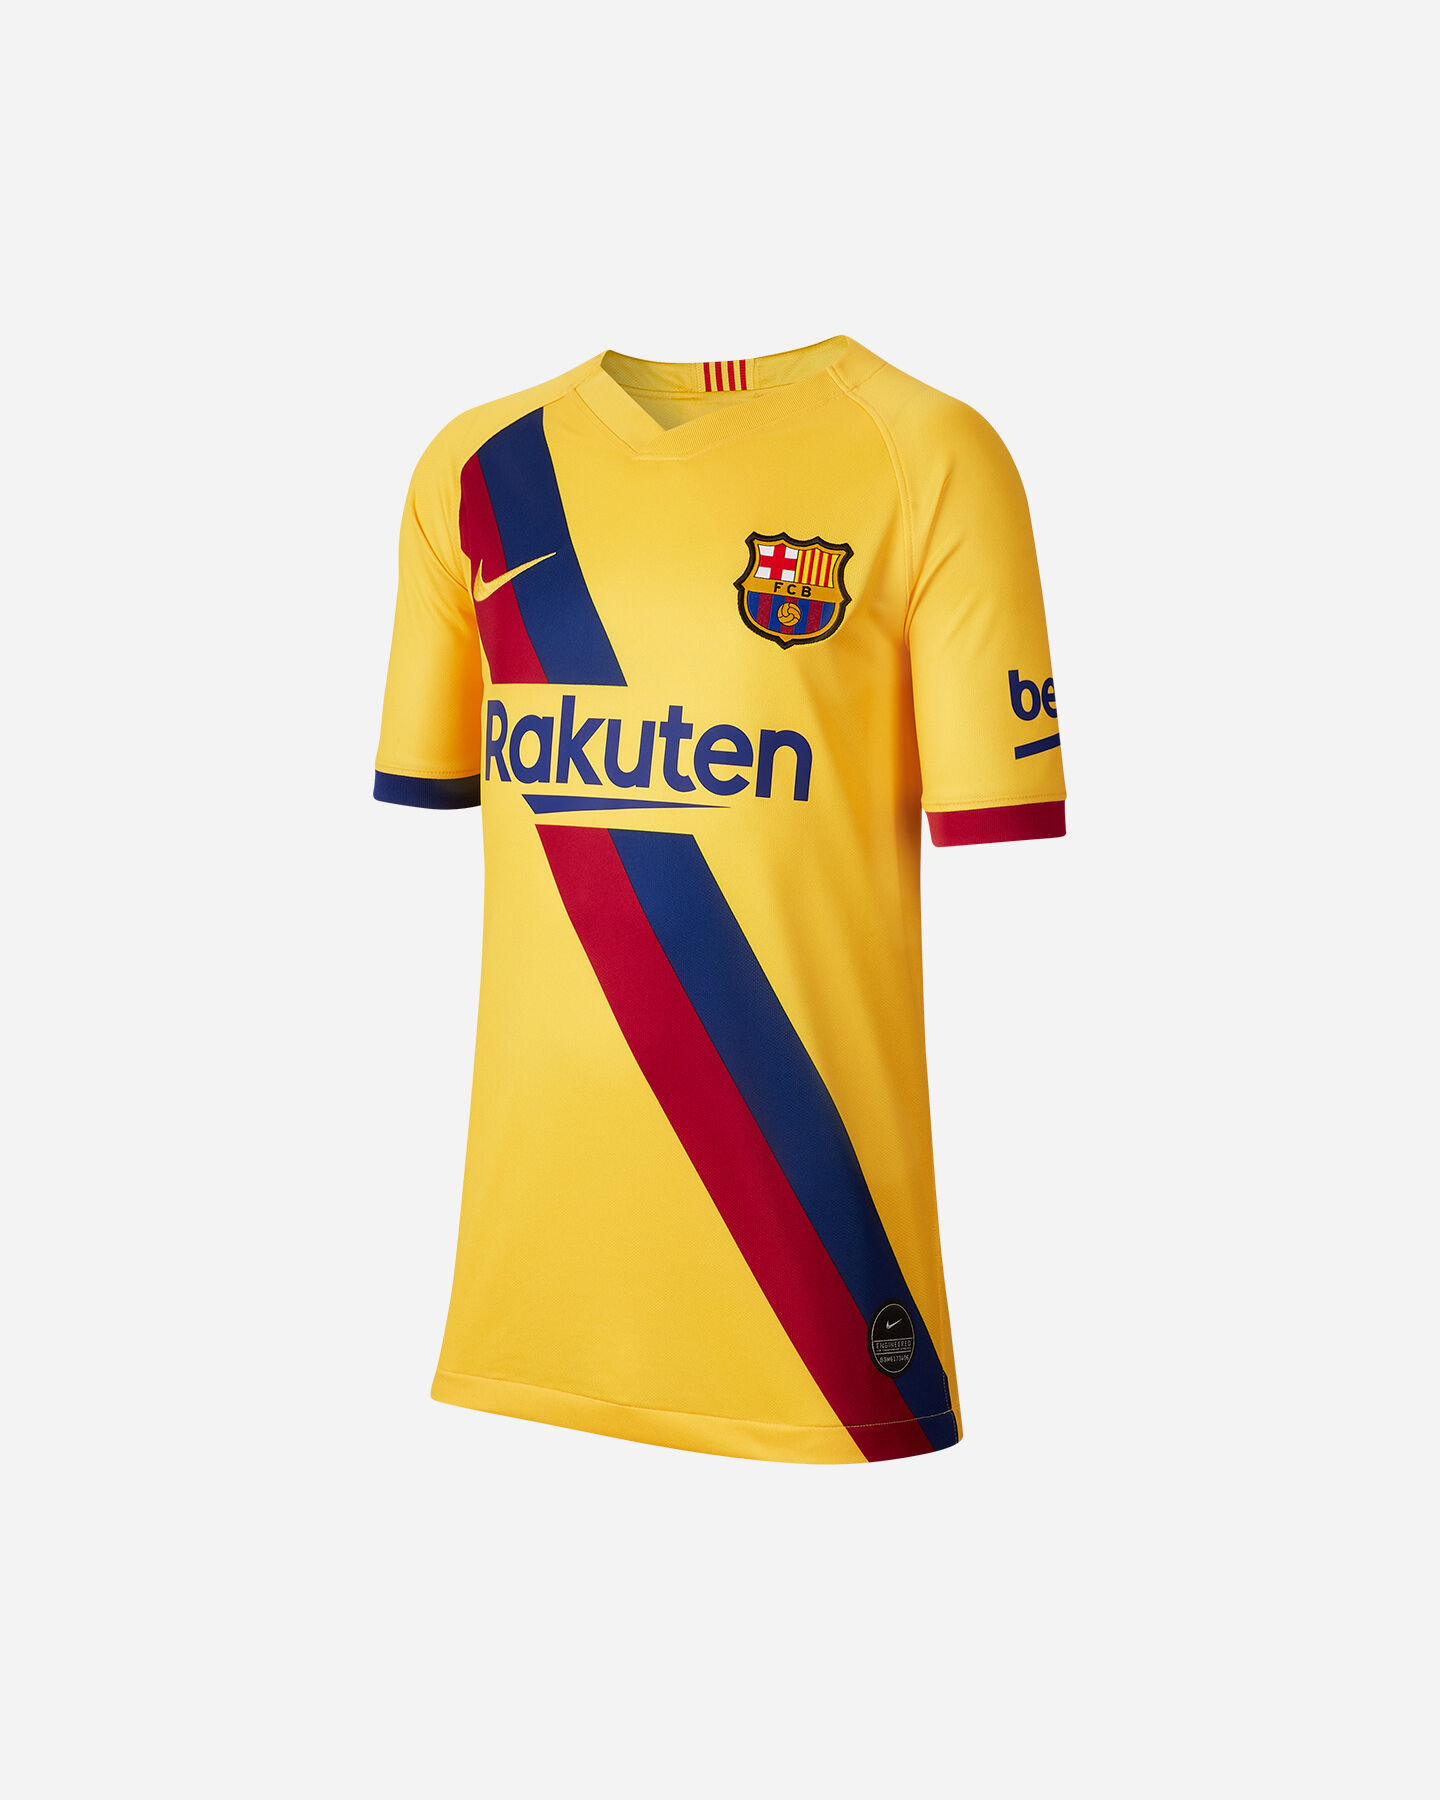 Yushoe Maglia da Uomo Barcelona Jersey Men Shirt 20-21 Home And ...